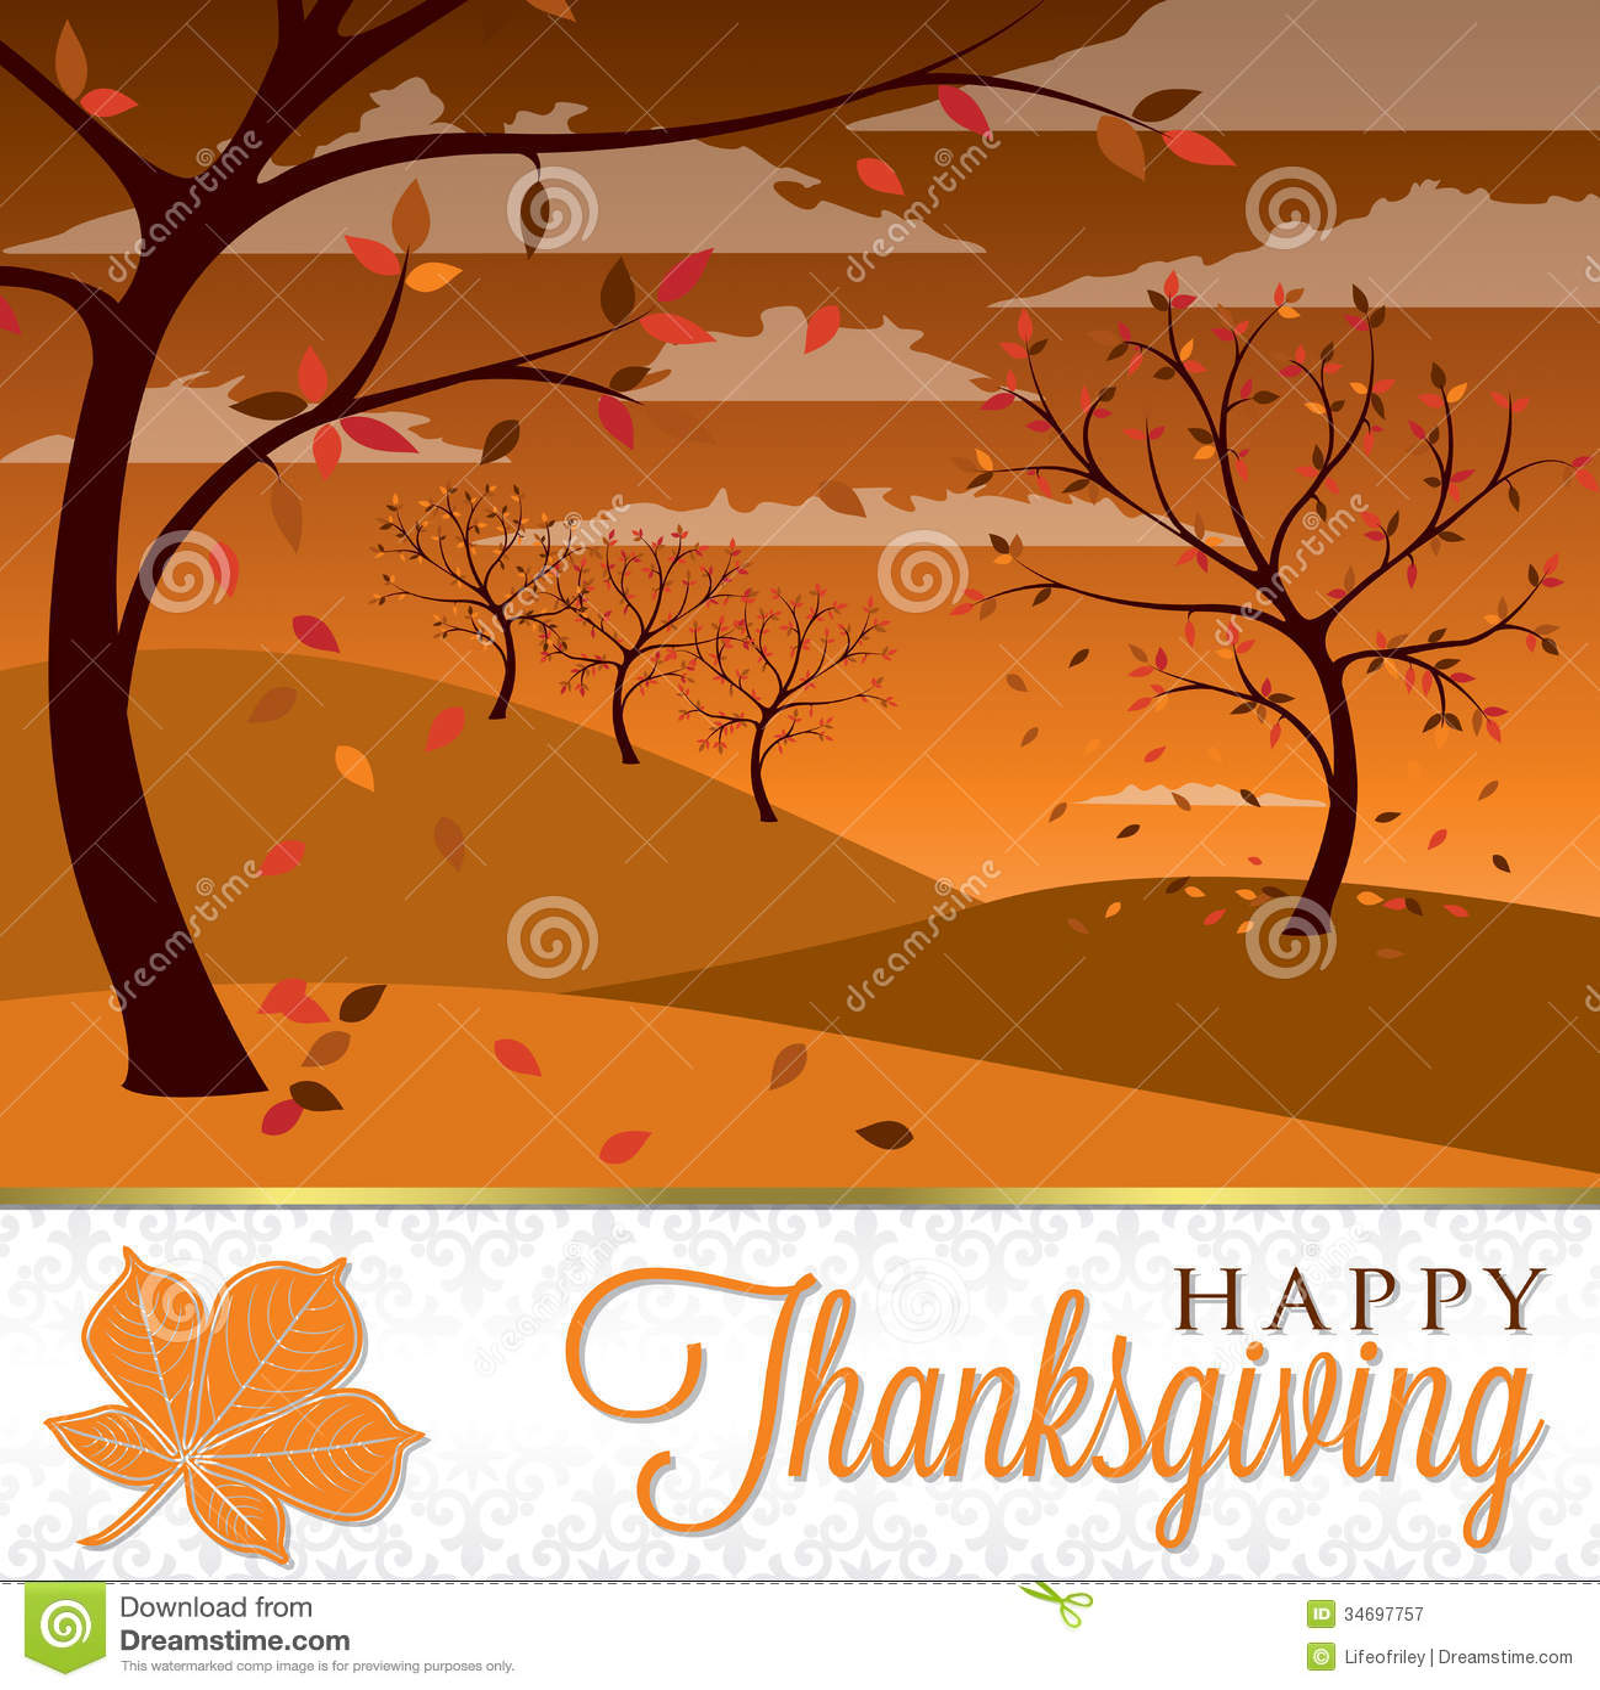 happy thanksgiving stock illustration illustration of elegant